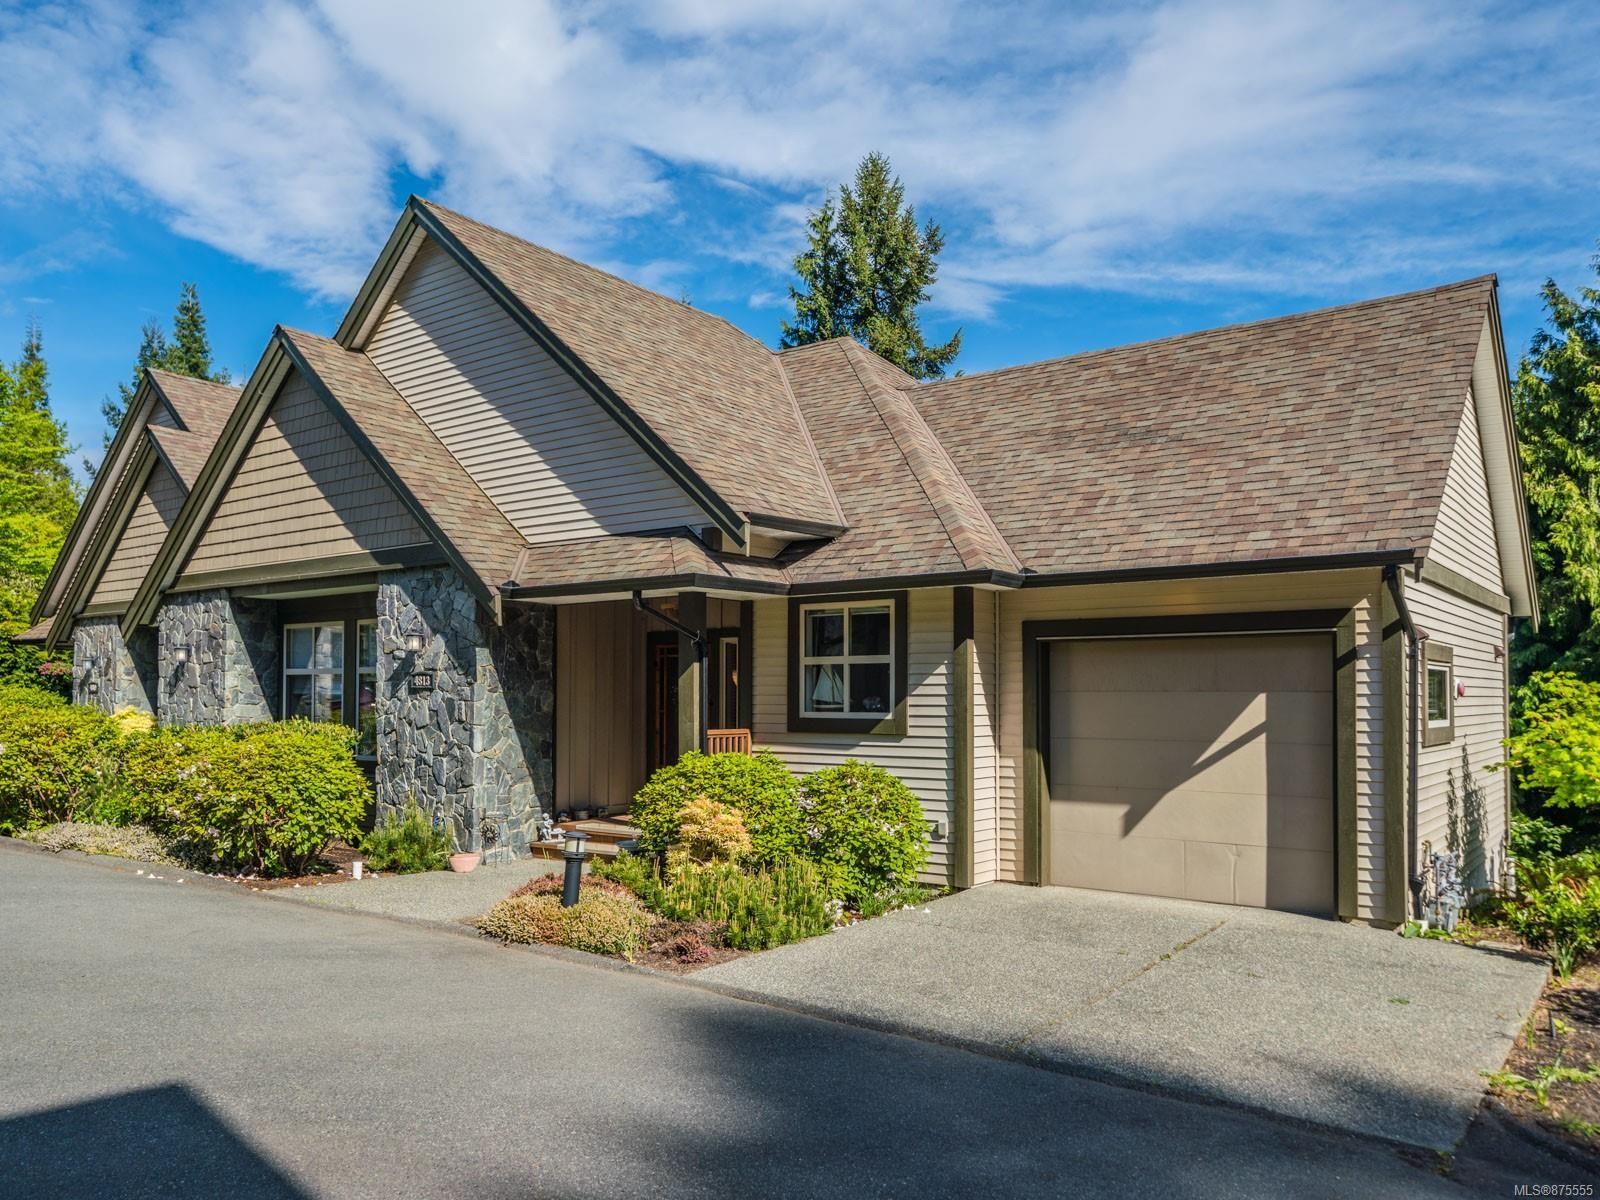 Main Photo: 4813 Bridgewood Close in : Na North Nanaimo Row/Townhouse for sale (Nanaimo)  : MLS®# 875555